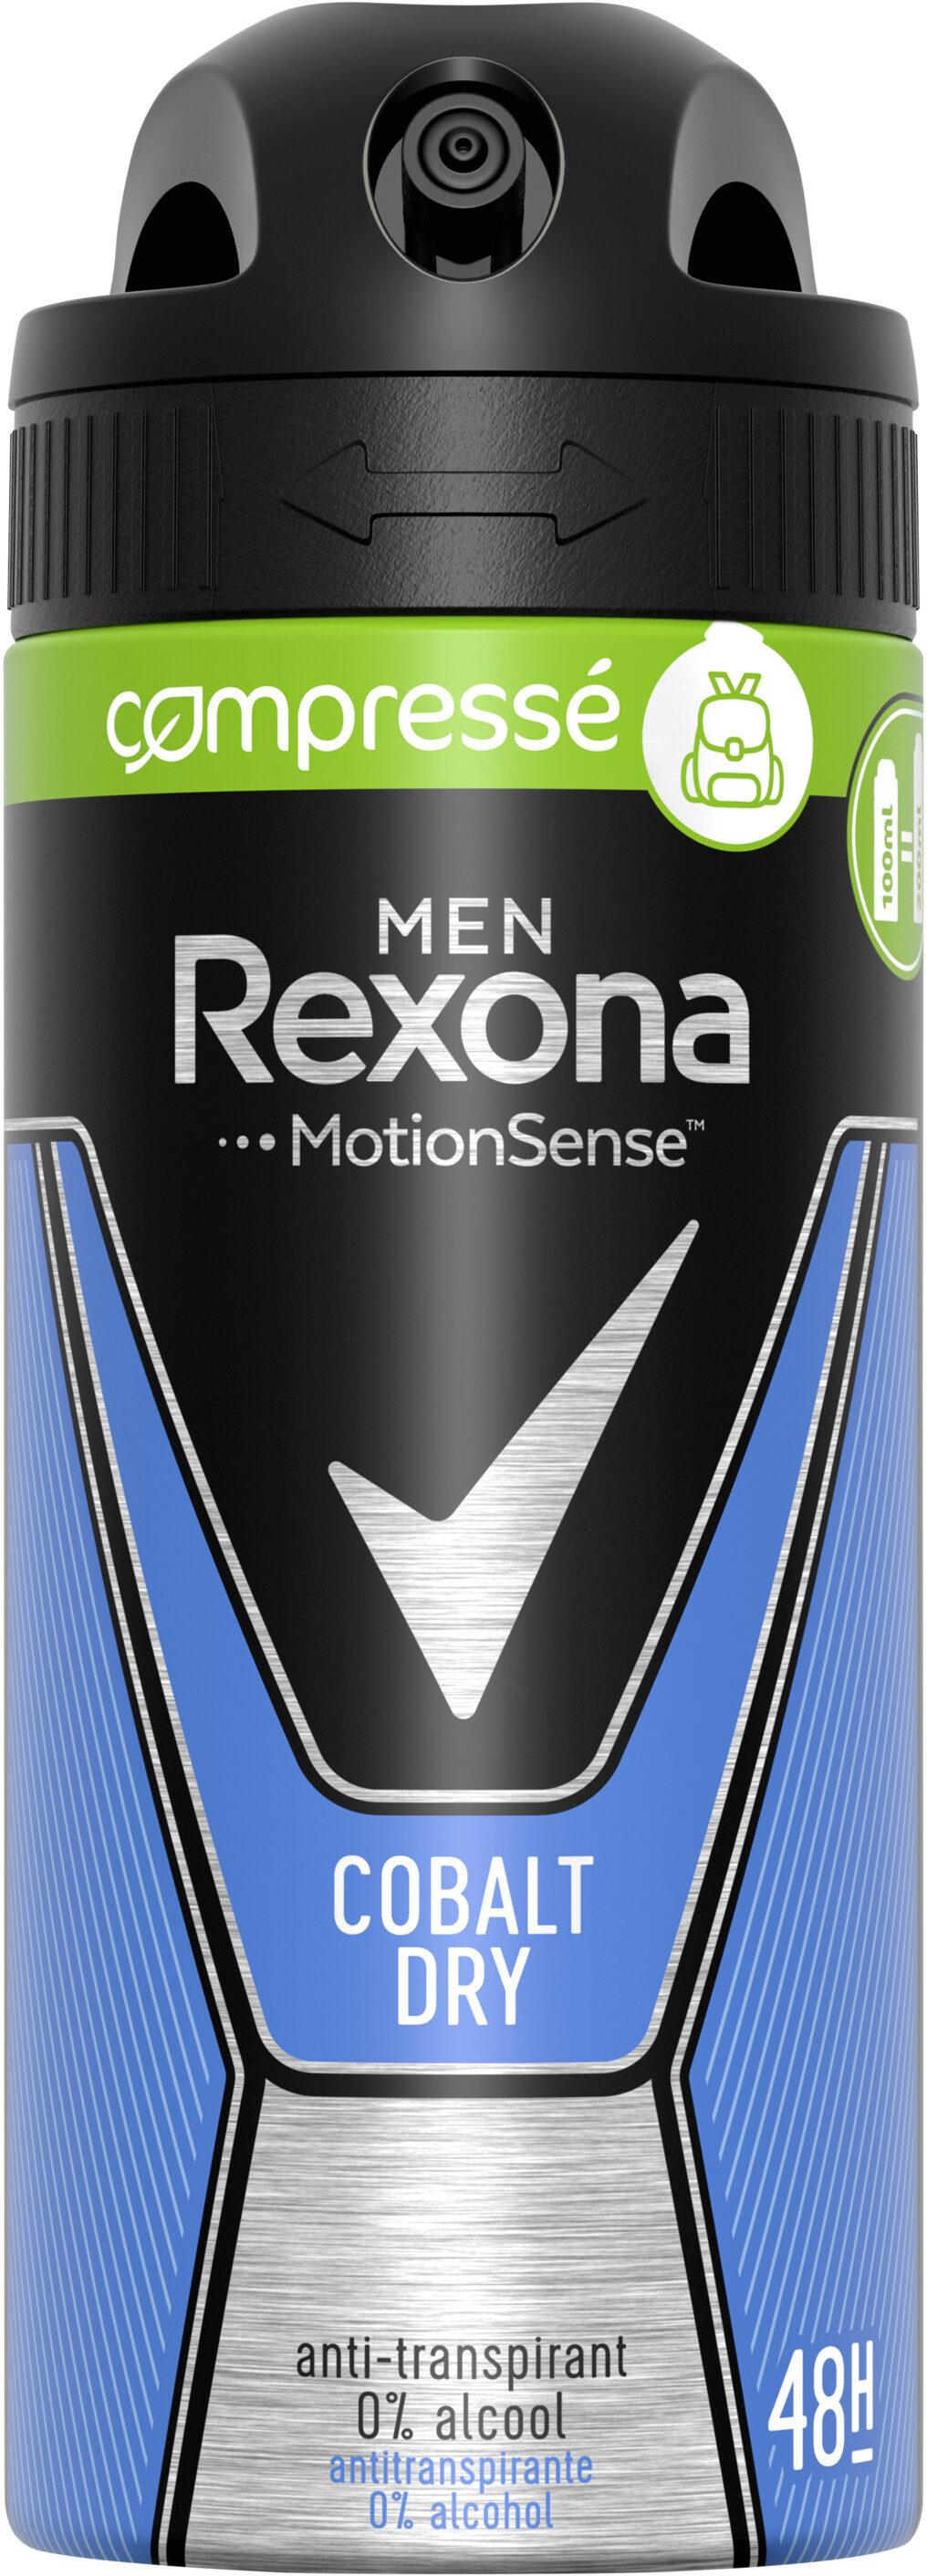 REXONA MEN Men Anti-Transpirant Cobalt Dry Spray Compressé - Product - fr